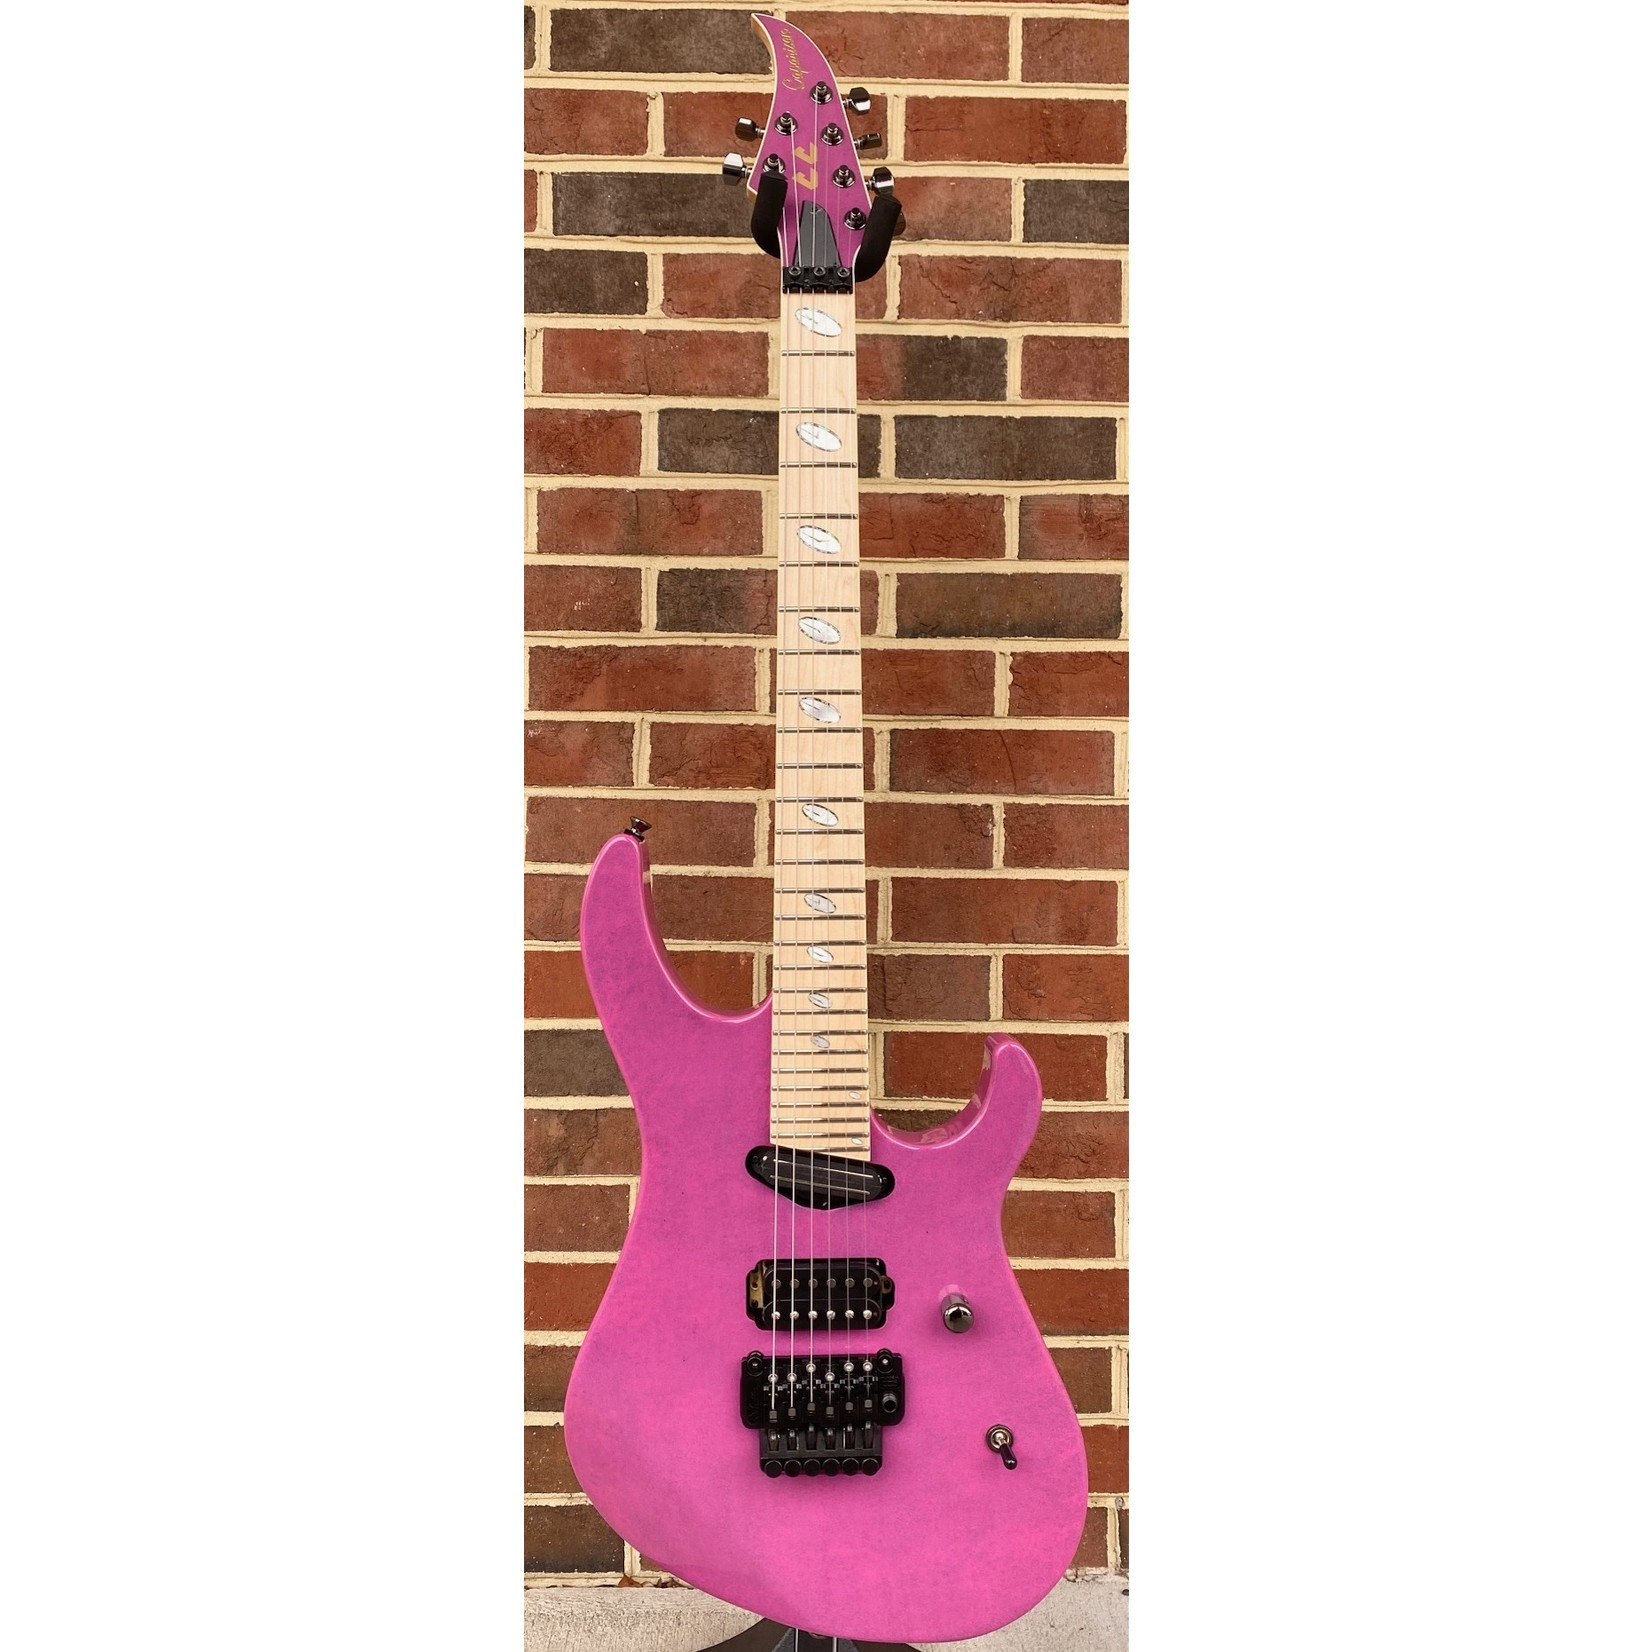 Caparison Guitars Caparison Horus-M3 CC Courtney Cox Signature Model, Pink Sapphire